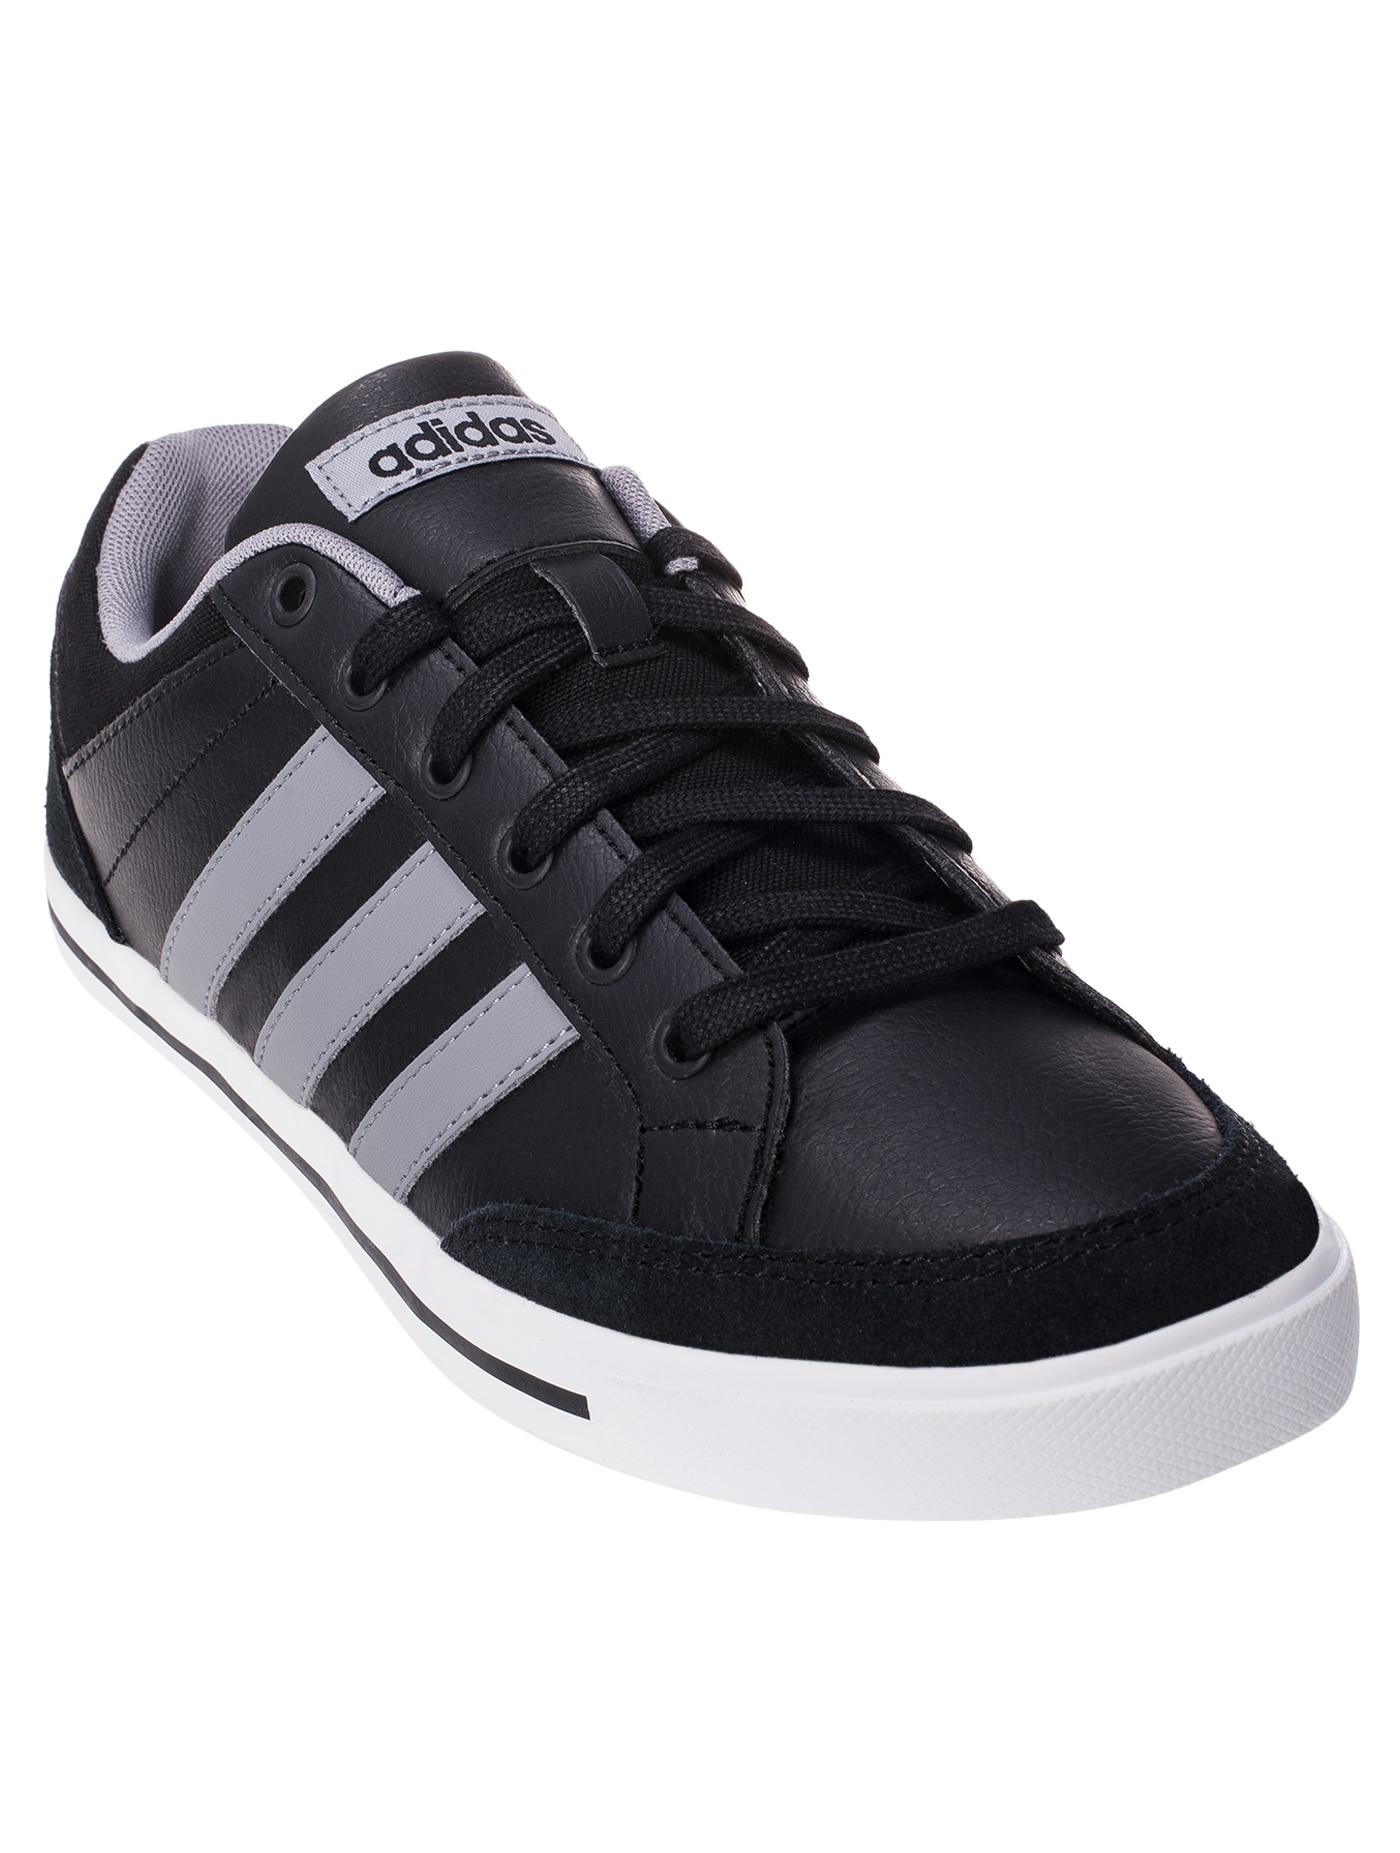 ADIDAS NEO Men's Casual Shoes Cacity BB9695 Size UK7_B